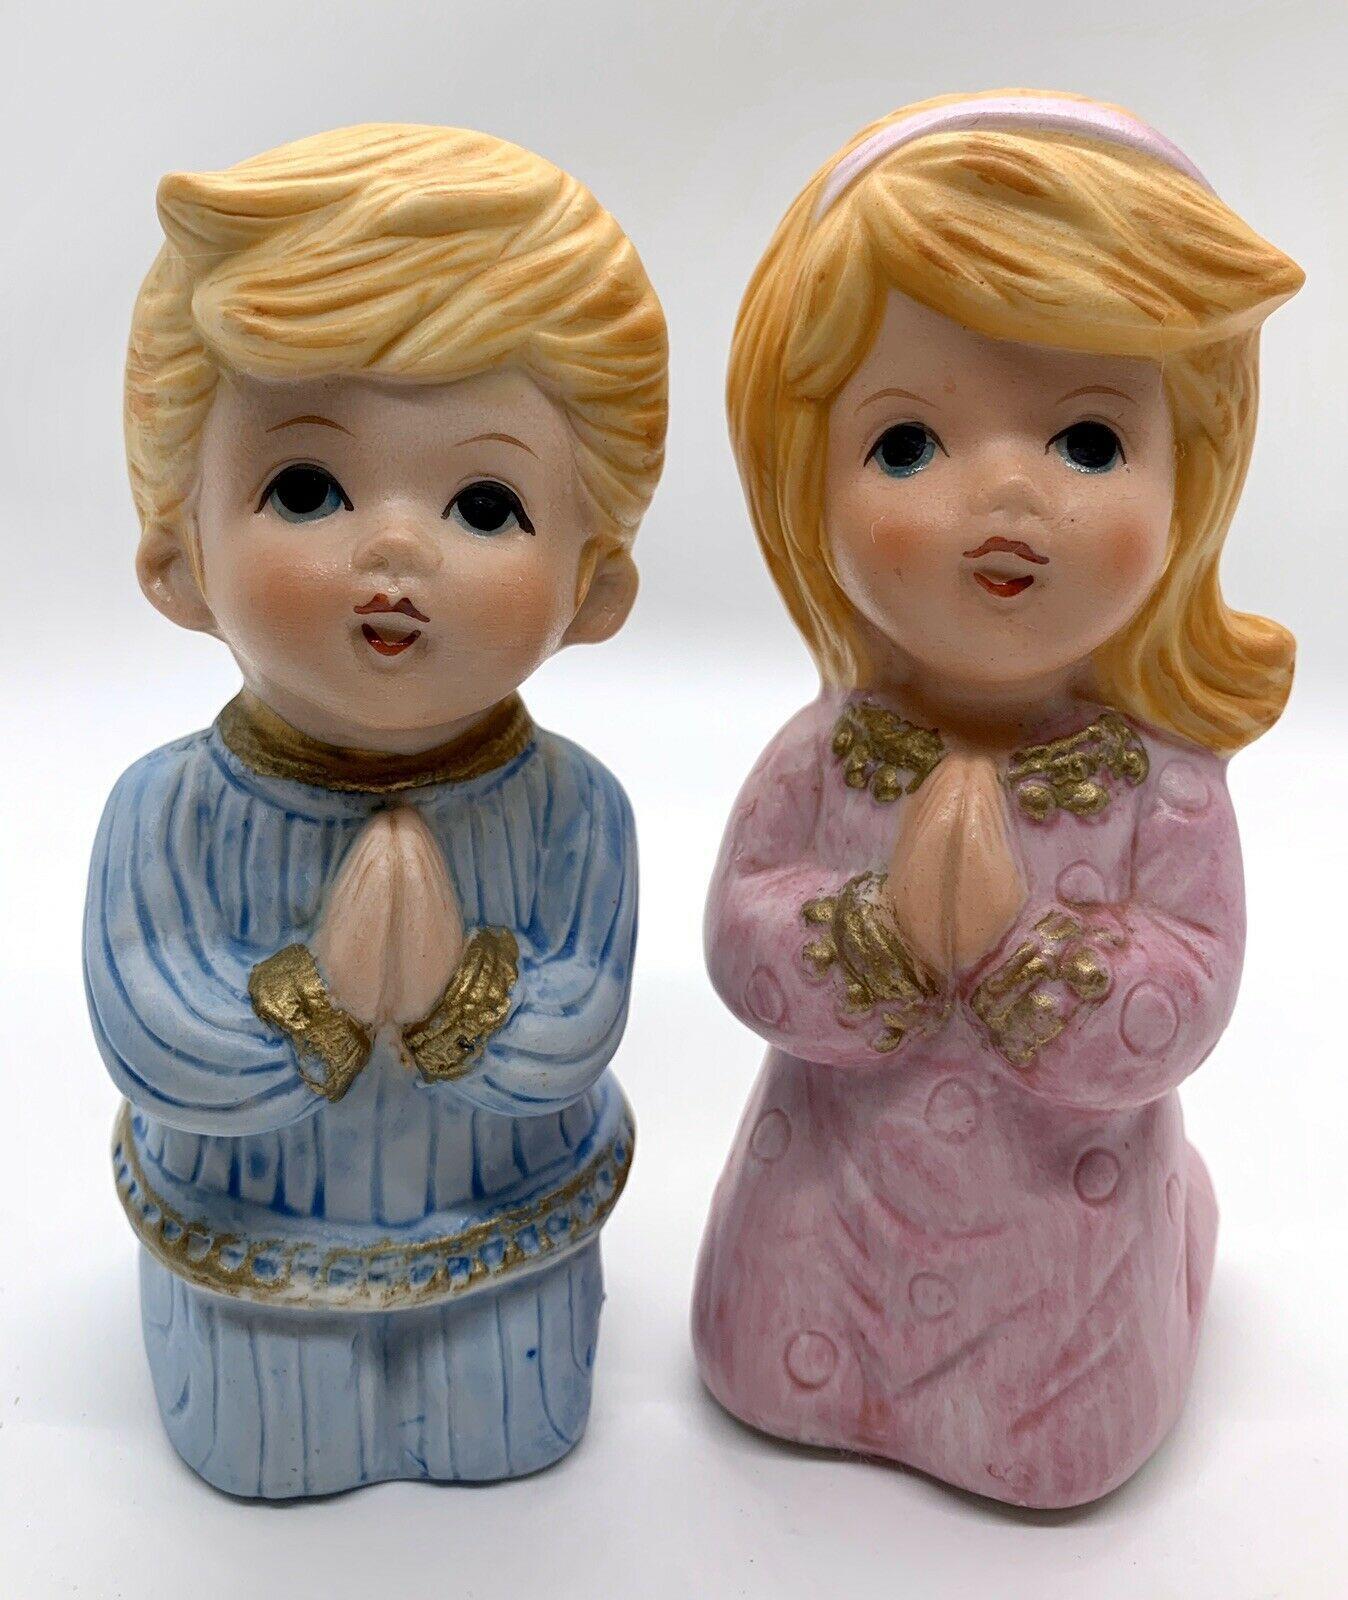 Vintage Homco Children Boy & Girl Kneeling  Praying Porcelain Figurines #5211 - $5.94